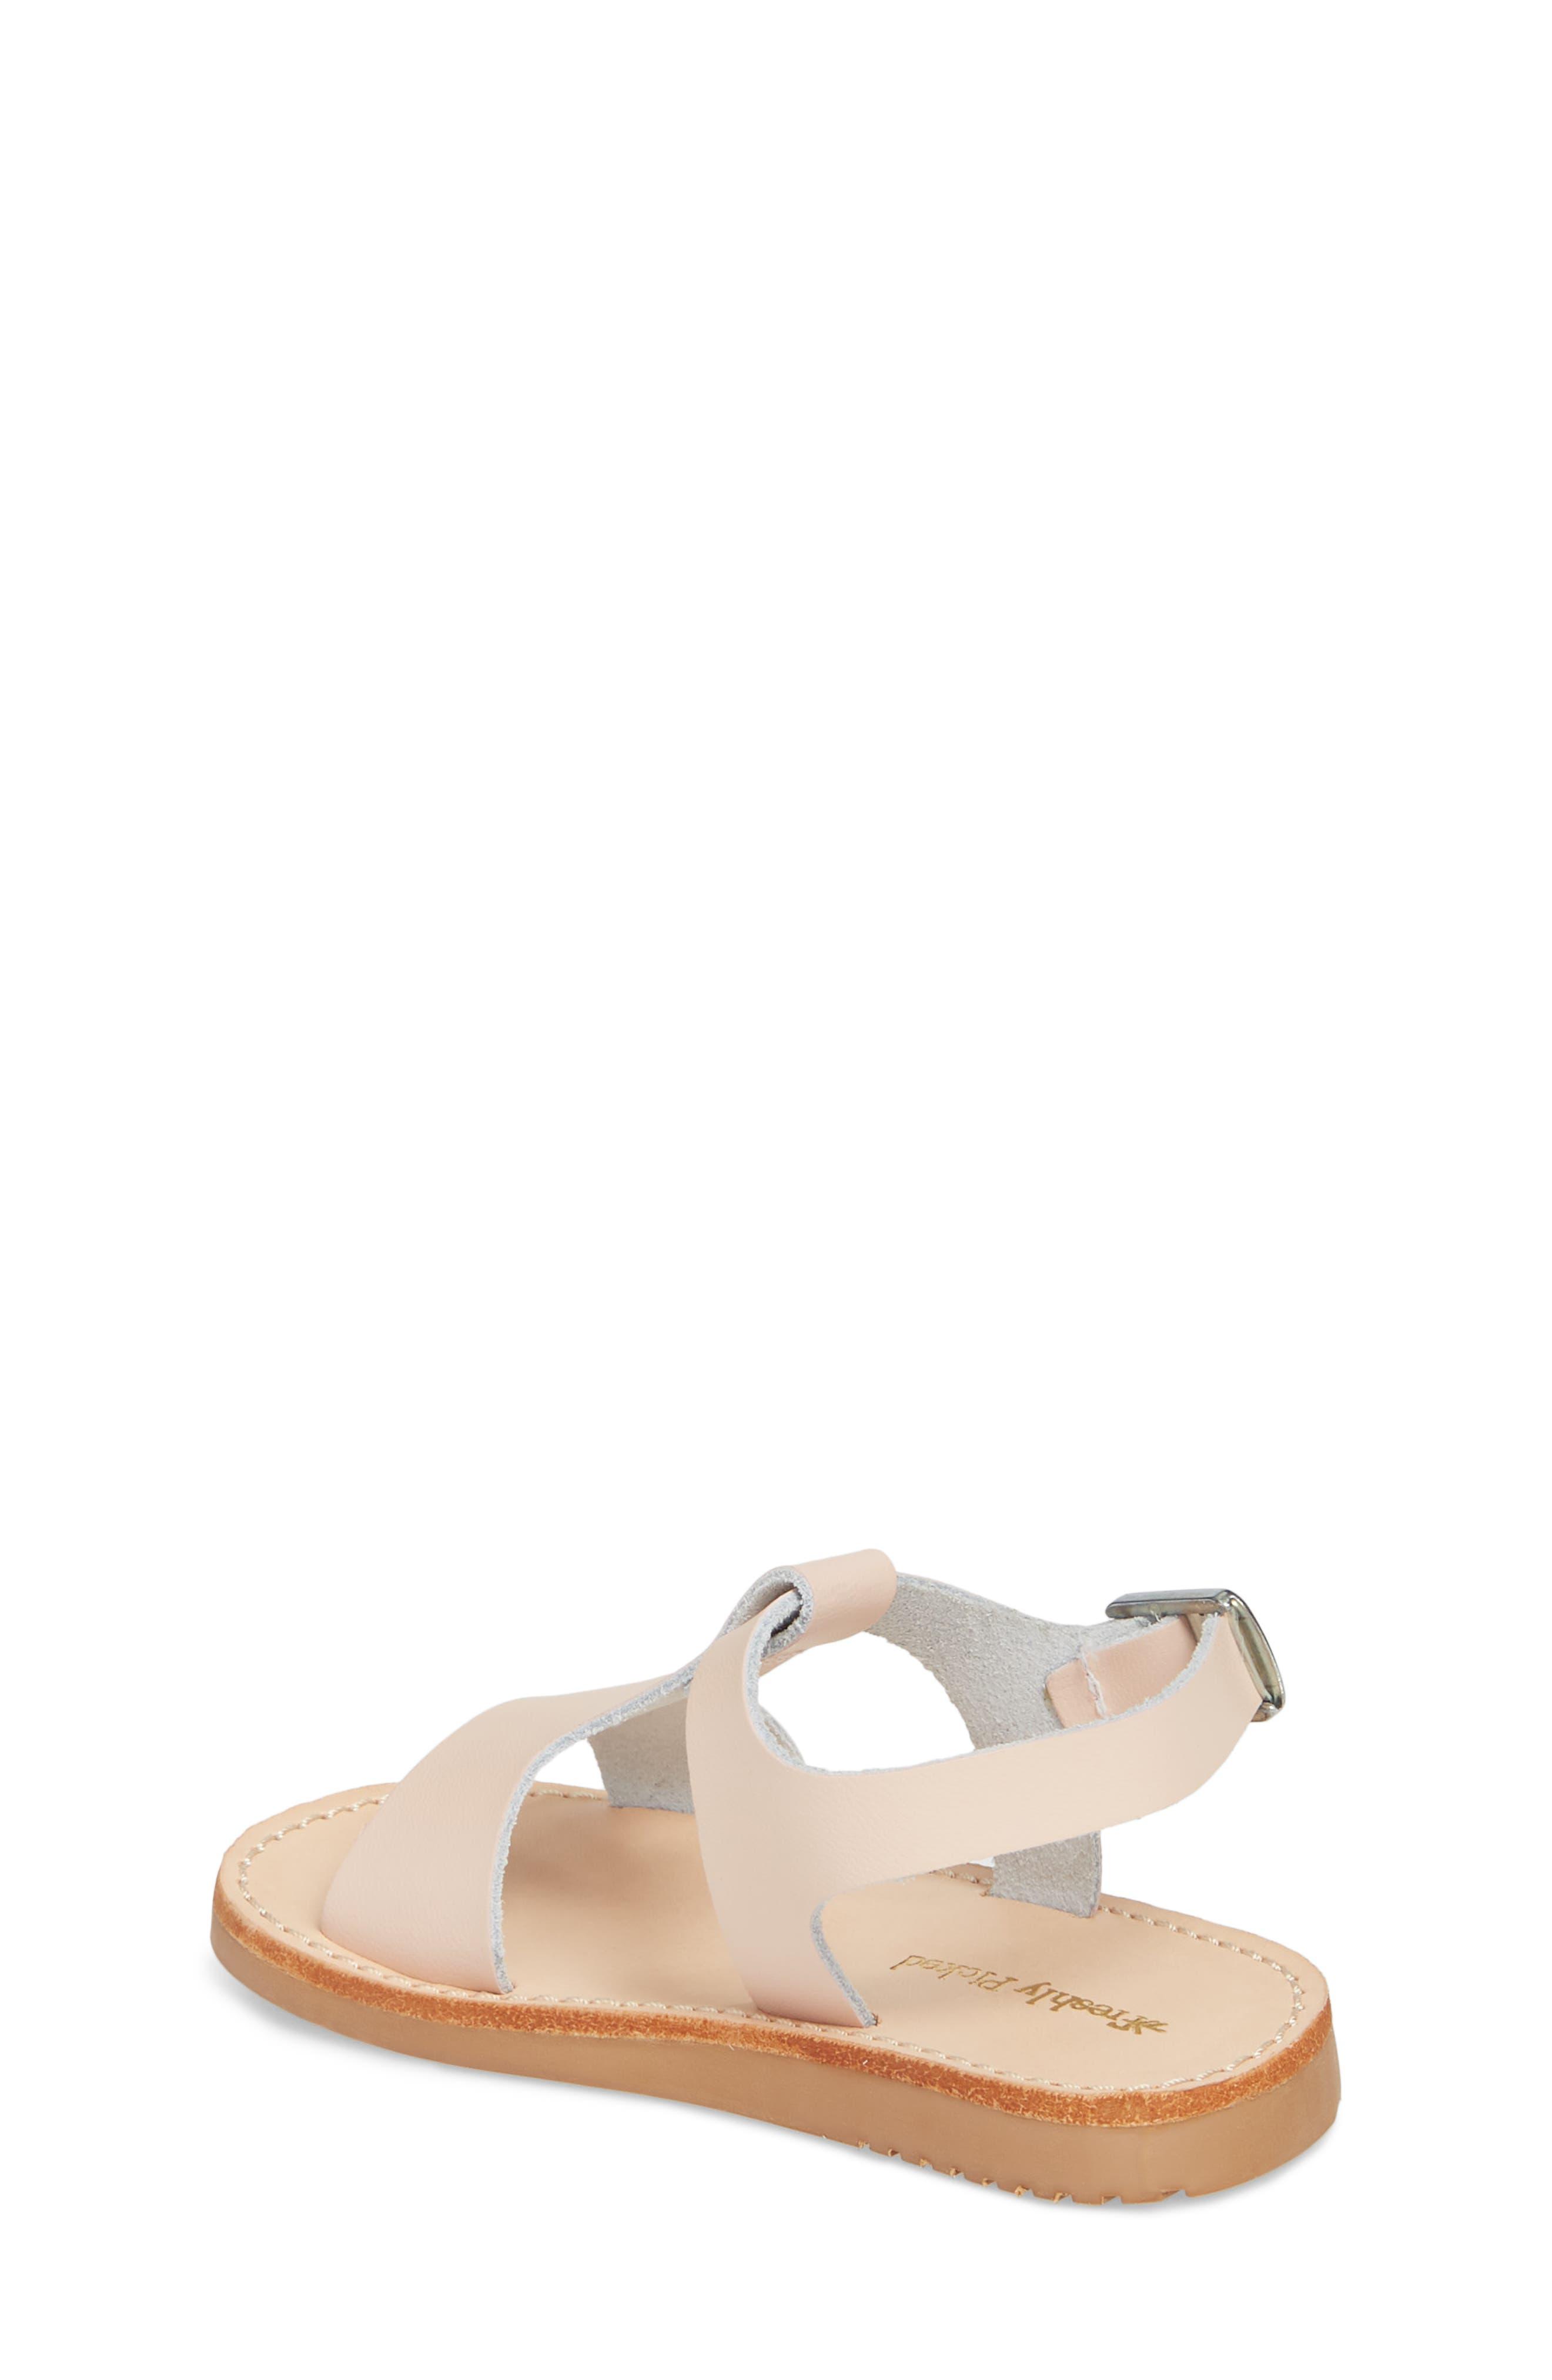 Malibu Water Resistant Sandal,                             Alternate thumbnail 2, color,                             Blush